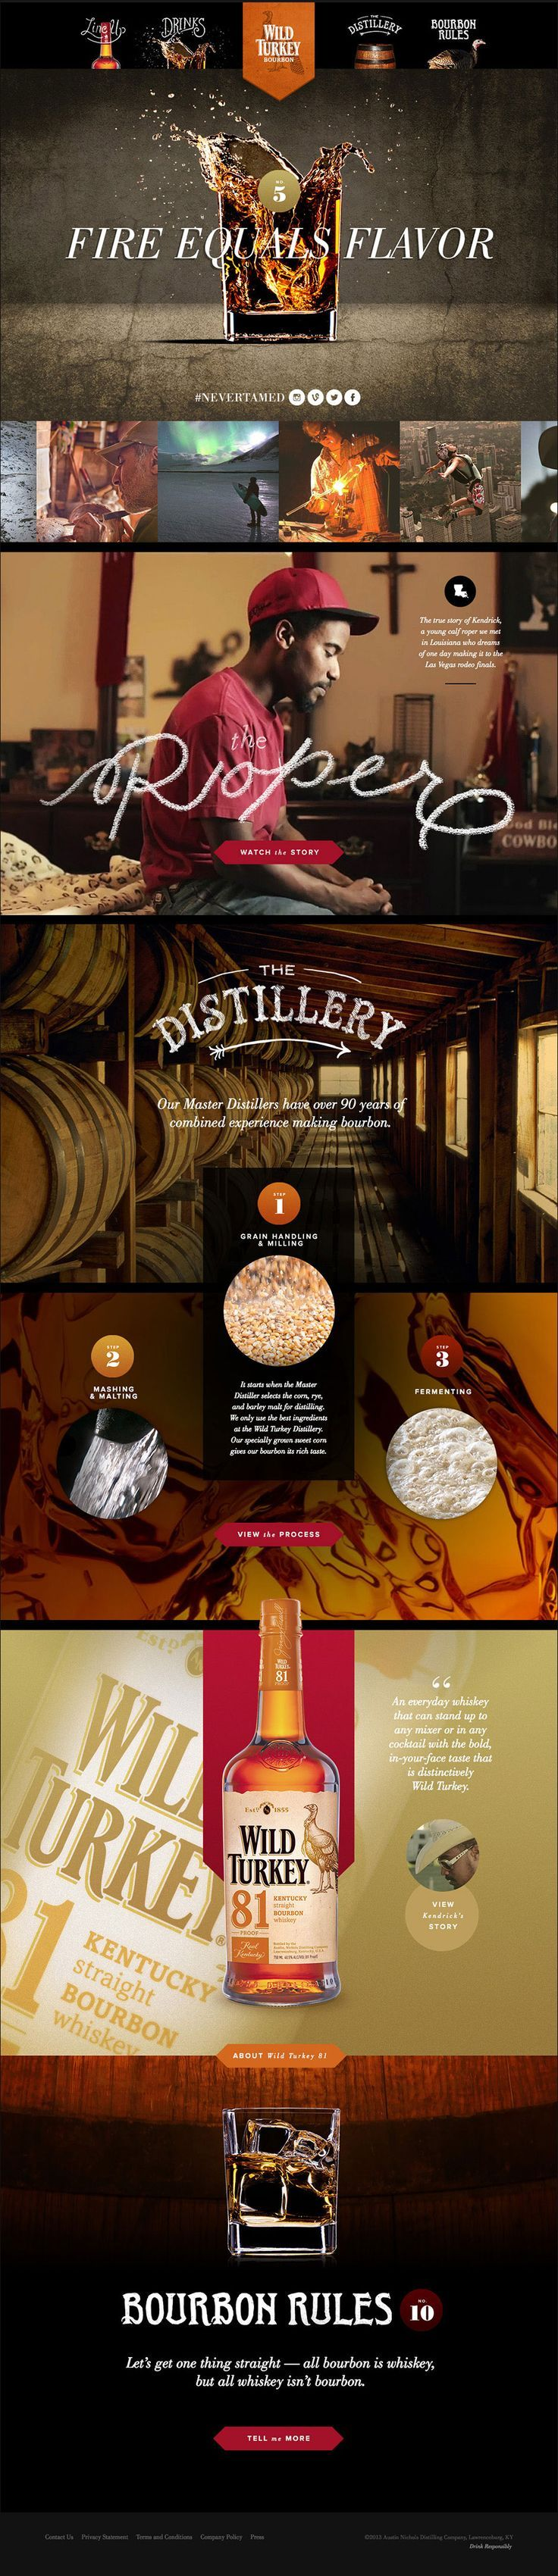 Wild Turkey Bourbon via @fromupnorth | #webdesign #it #web #design #layout #userinterface #website #webdesign repinned by www.BlickeDeeler.de | Visit our website www.blickedeeler.de/leistungen/webdesign